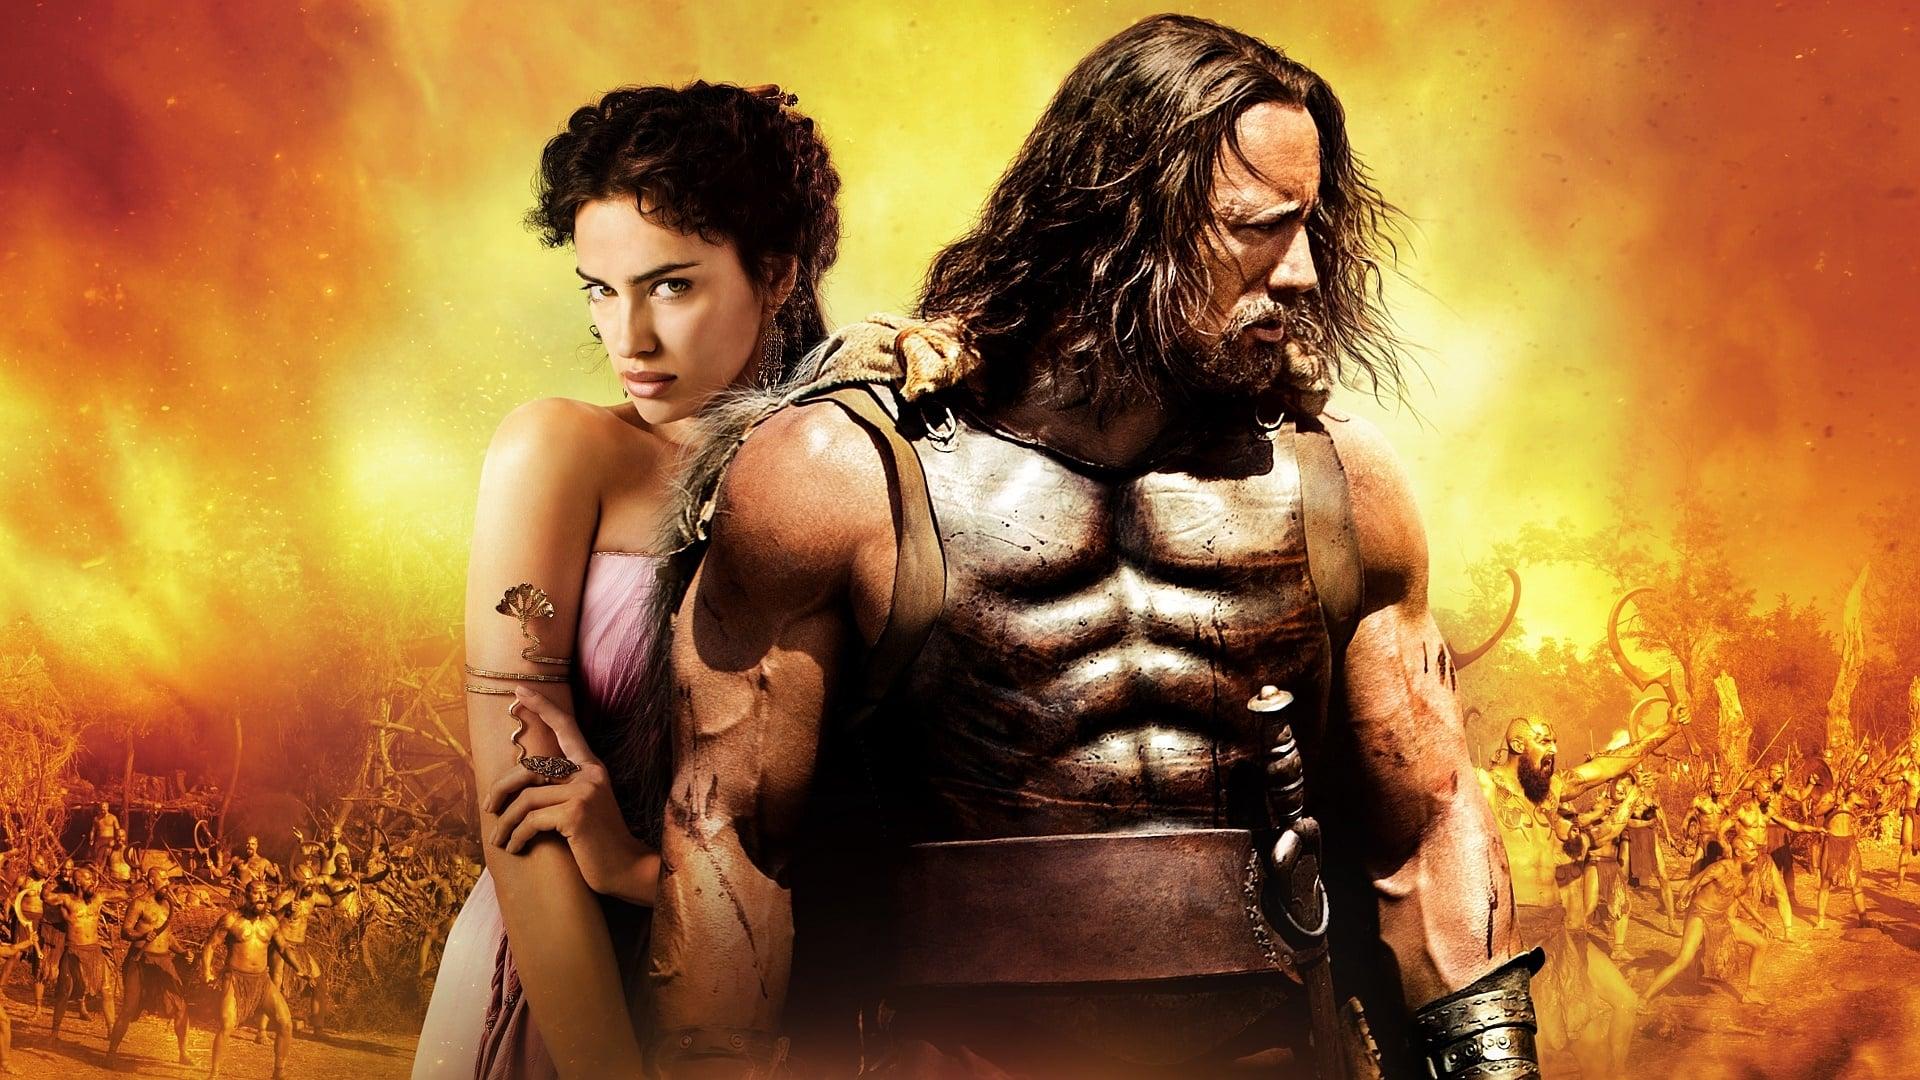 Regarder Hercule en streaming gratuit